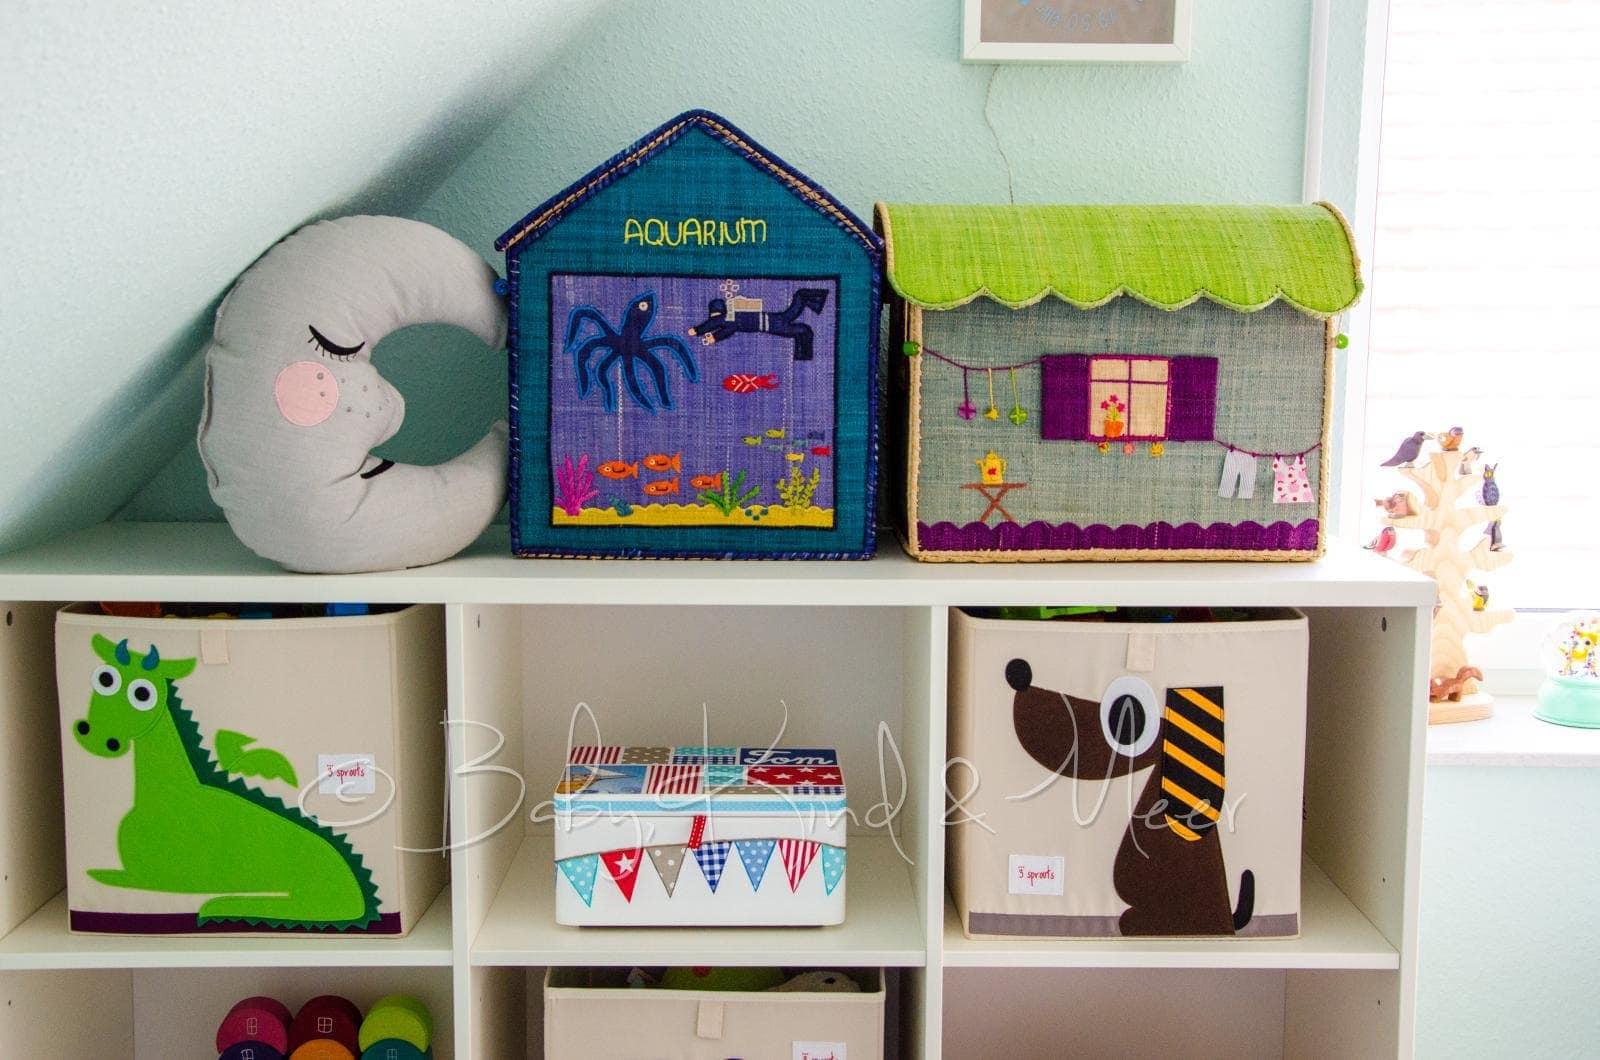 Cd aufbewahrung kinderzimmer cd aufbewahrung kinderzimmer - Cd aufbewahrung kinderzimmer ...